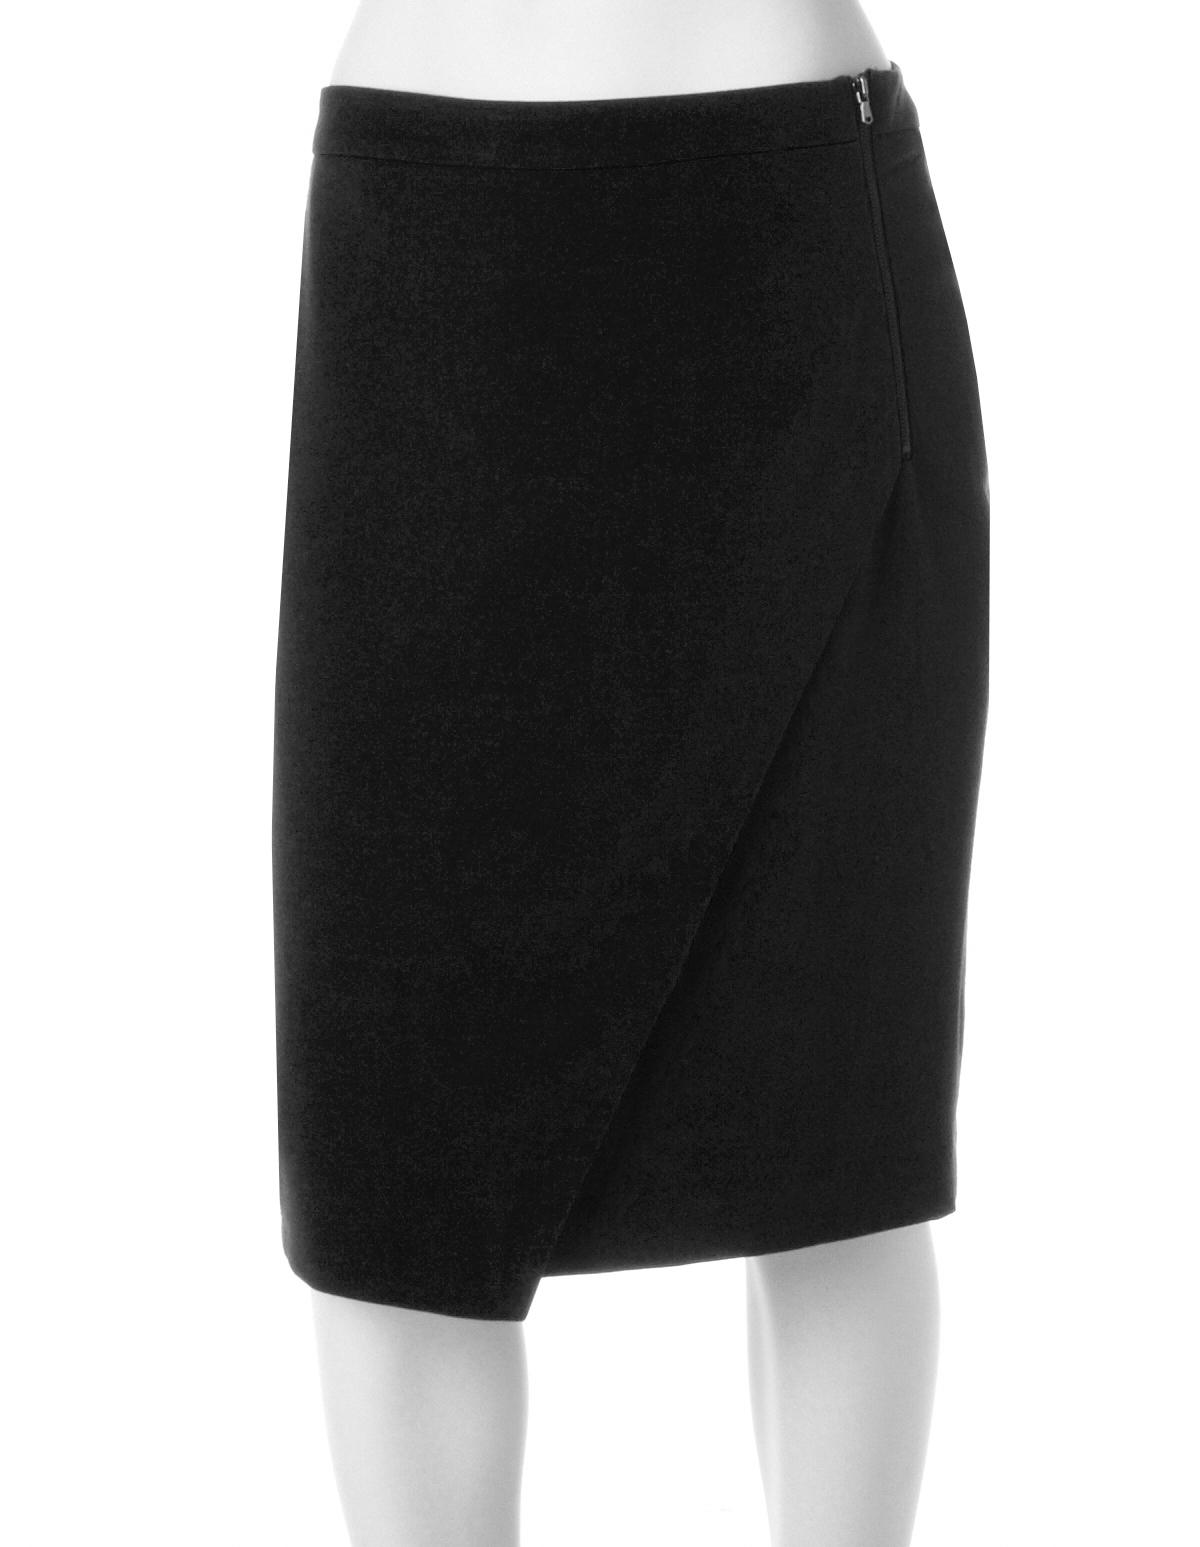 Black Wrap Pencil Skirt | Cleo